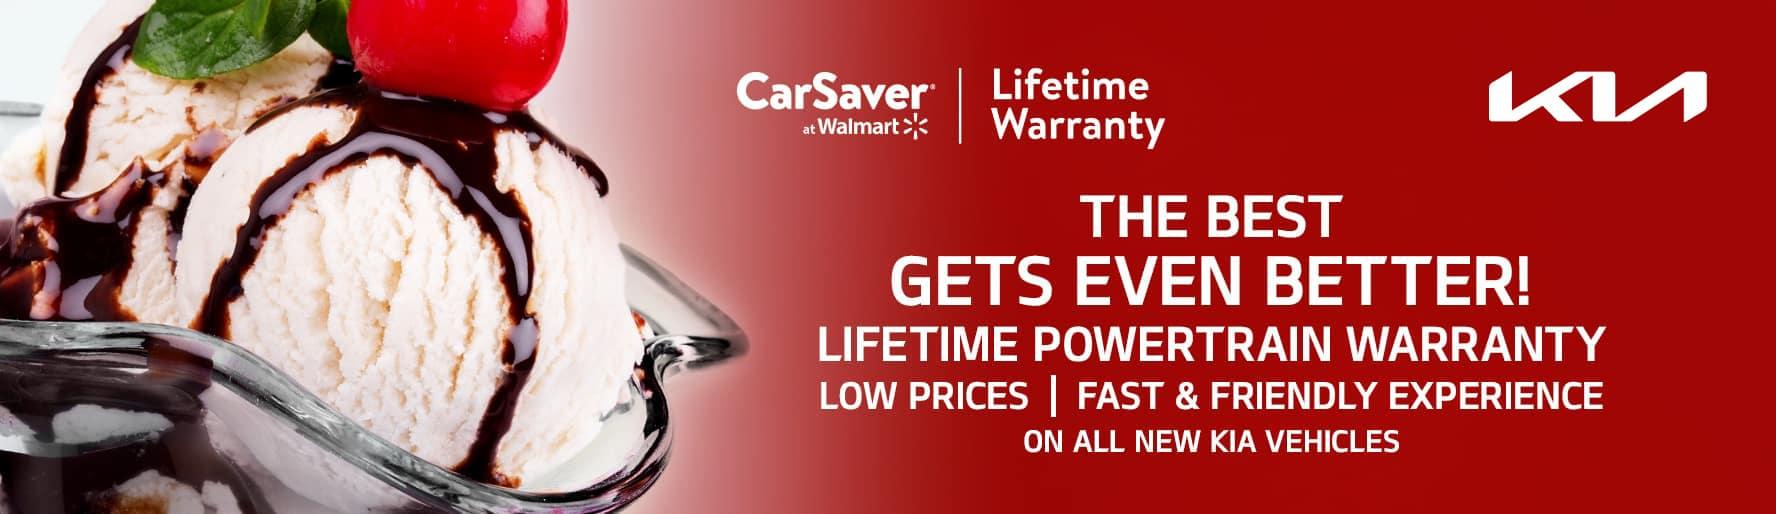 carsaver-program-by-walmart-limited-powertrain-warranty-at-shawnee-mission-kia-dealership.jpg